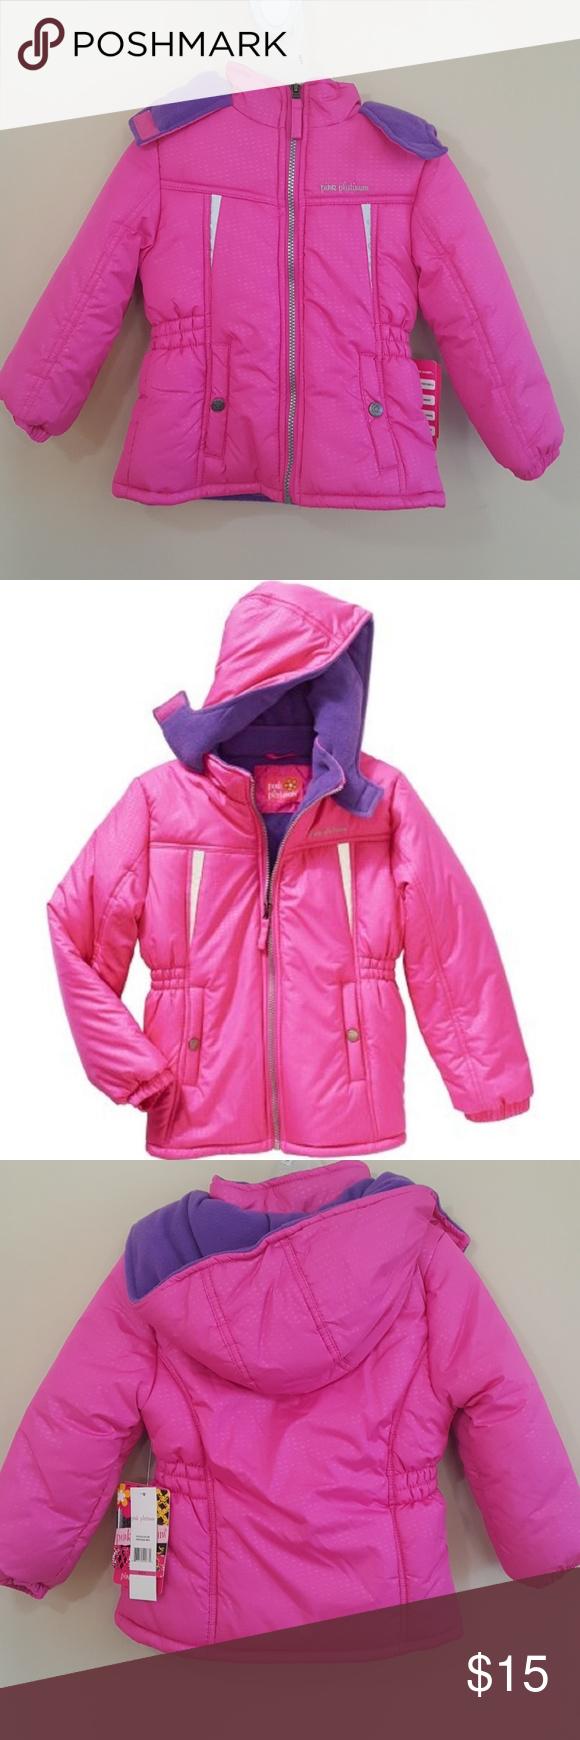 Pink Platinum Fleece Lined Puffer Jacket Fashion Clothes Design Fashion Design [ 1740 x 580 Pixel ]